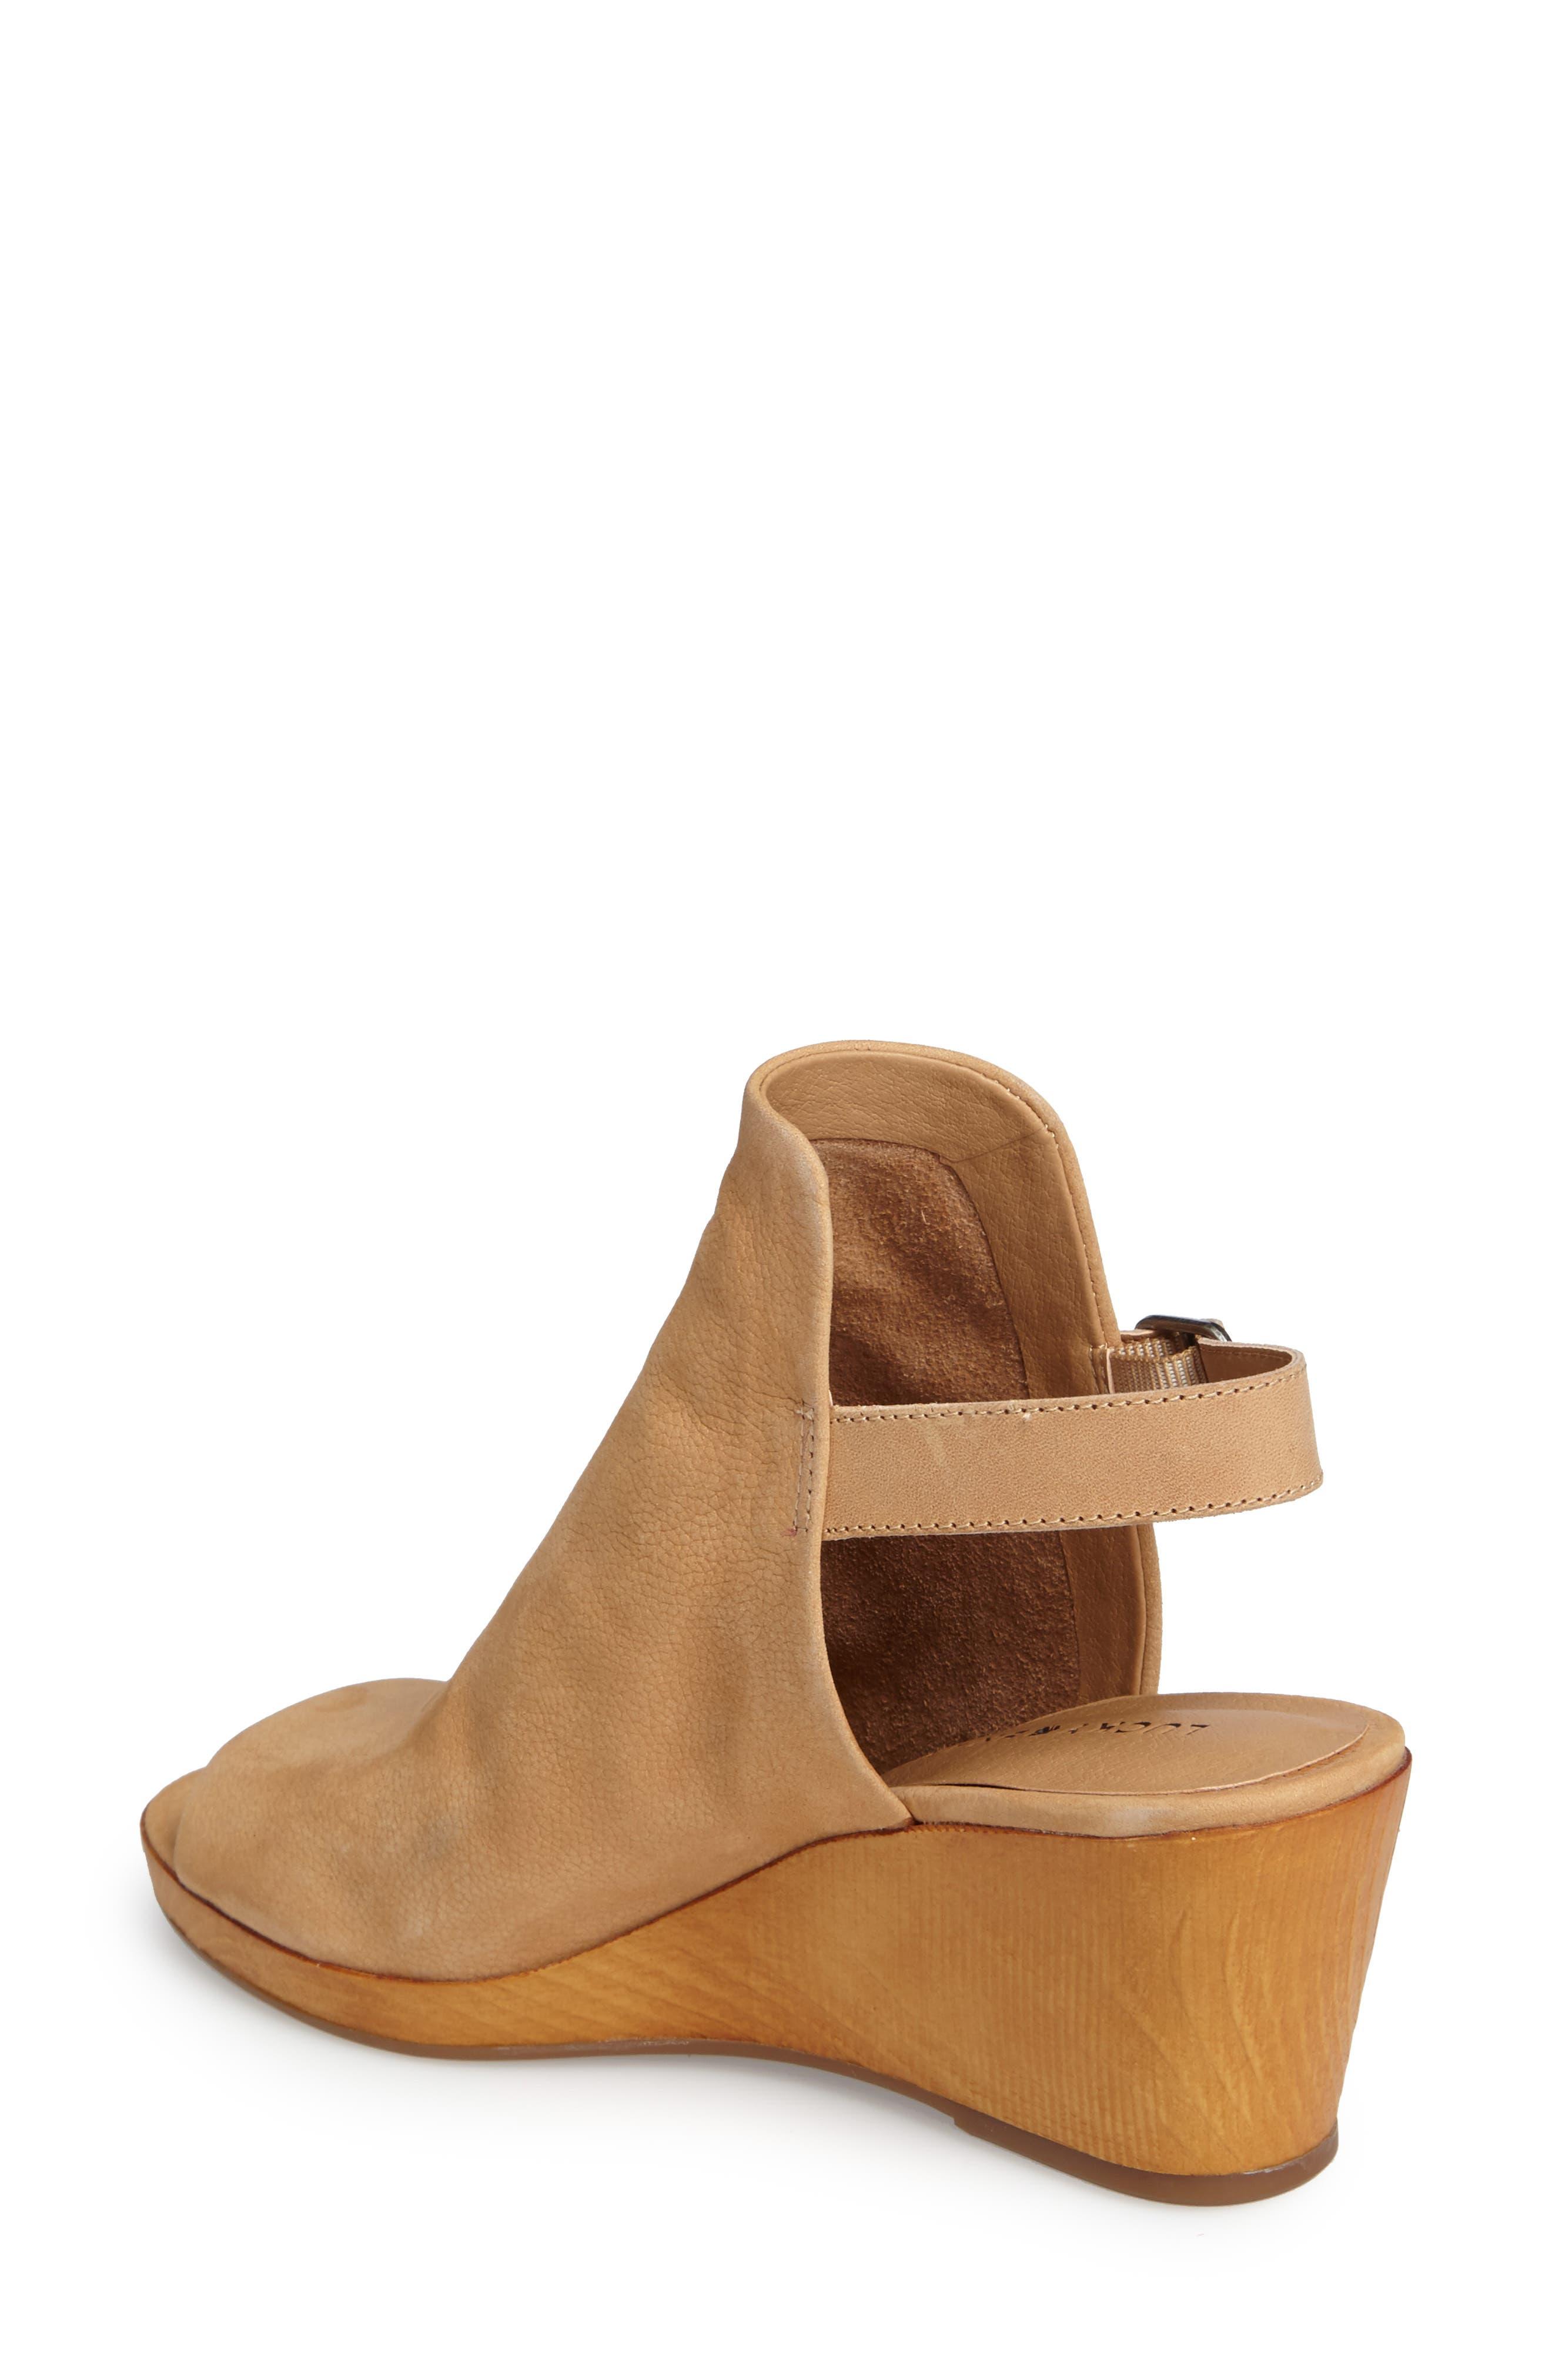 Keralin Wedge Sandal,                             Alternate thumbnail 2, color,                             Glazed Leather